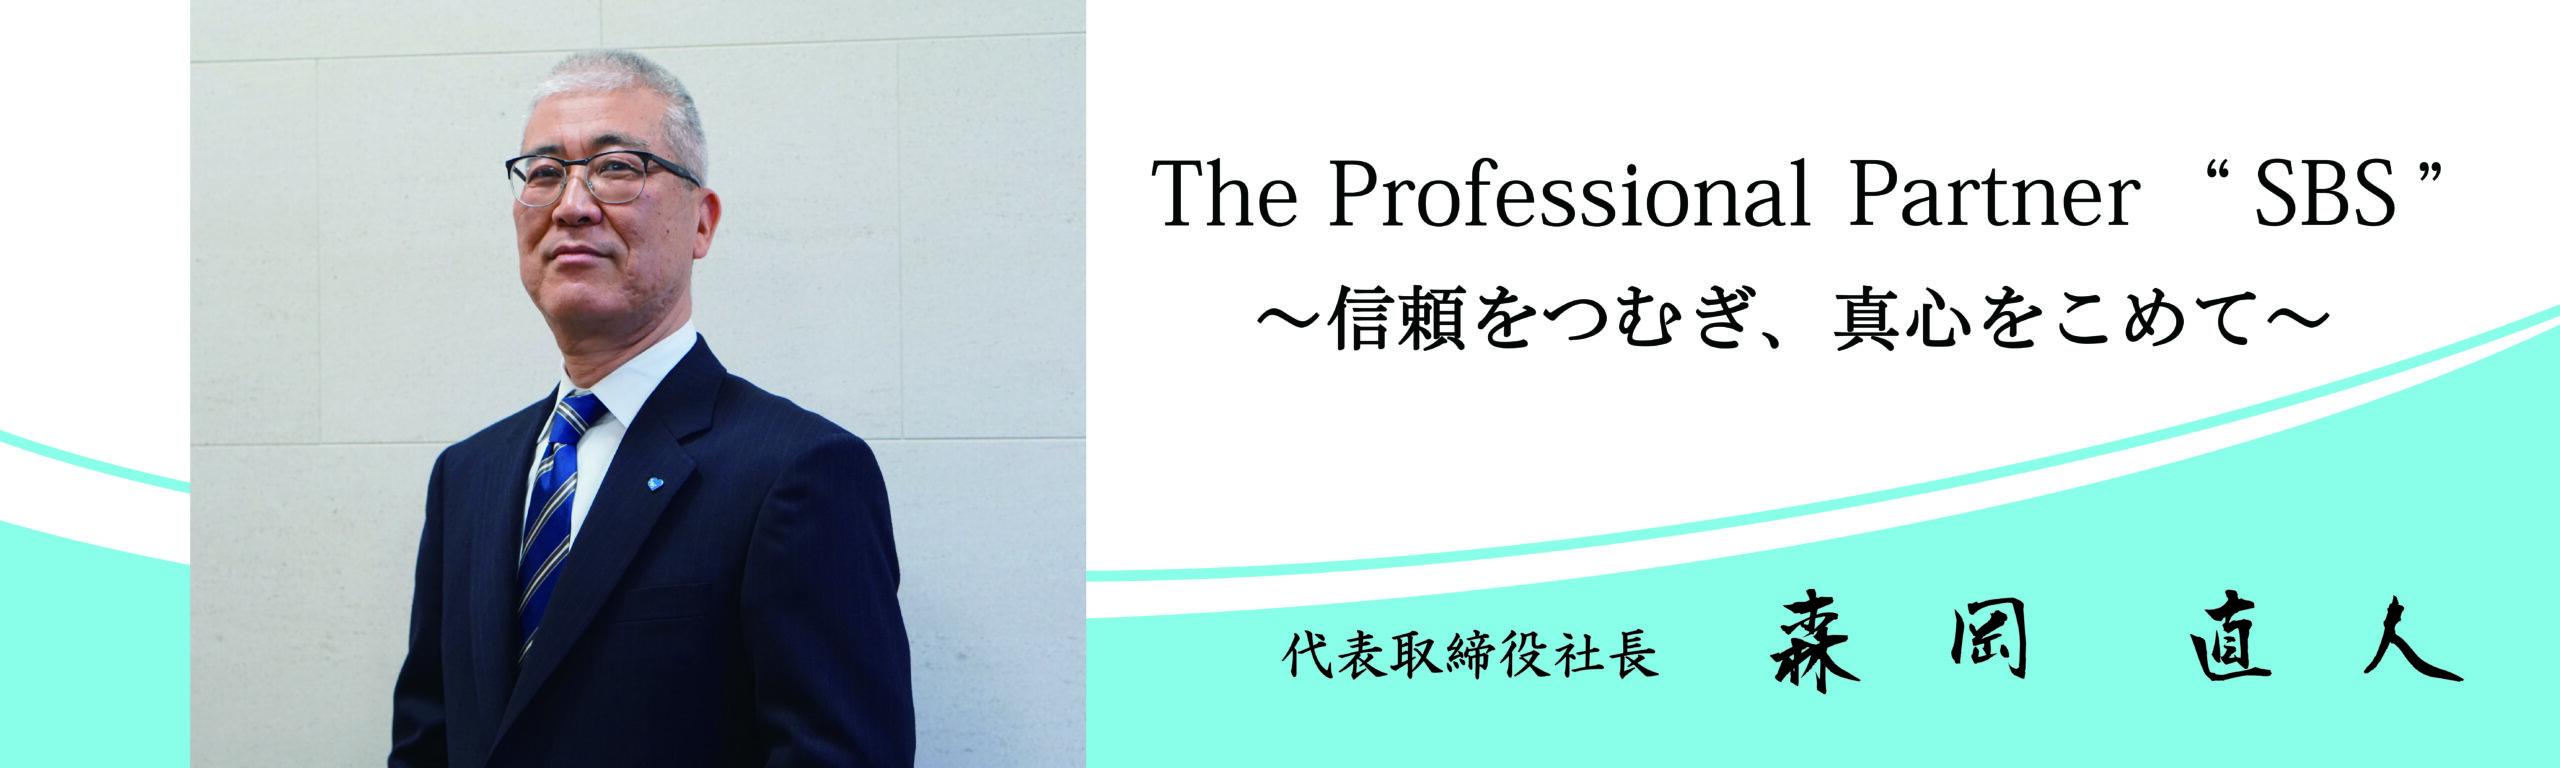 "「TheProfessionalPartner""SBS""~信頼をつむぎ、真心をこめて~」代表取締役社長 森岡 直人"